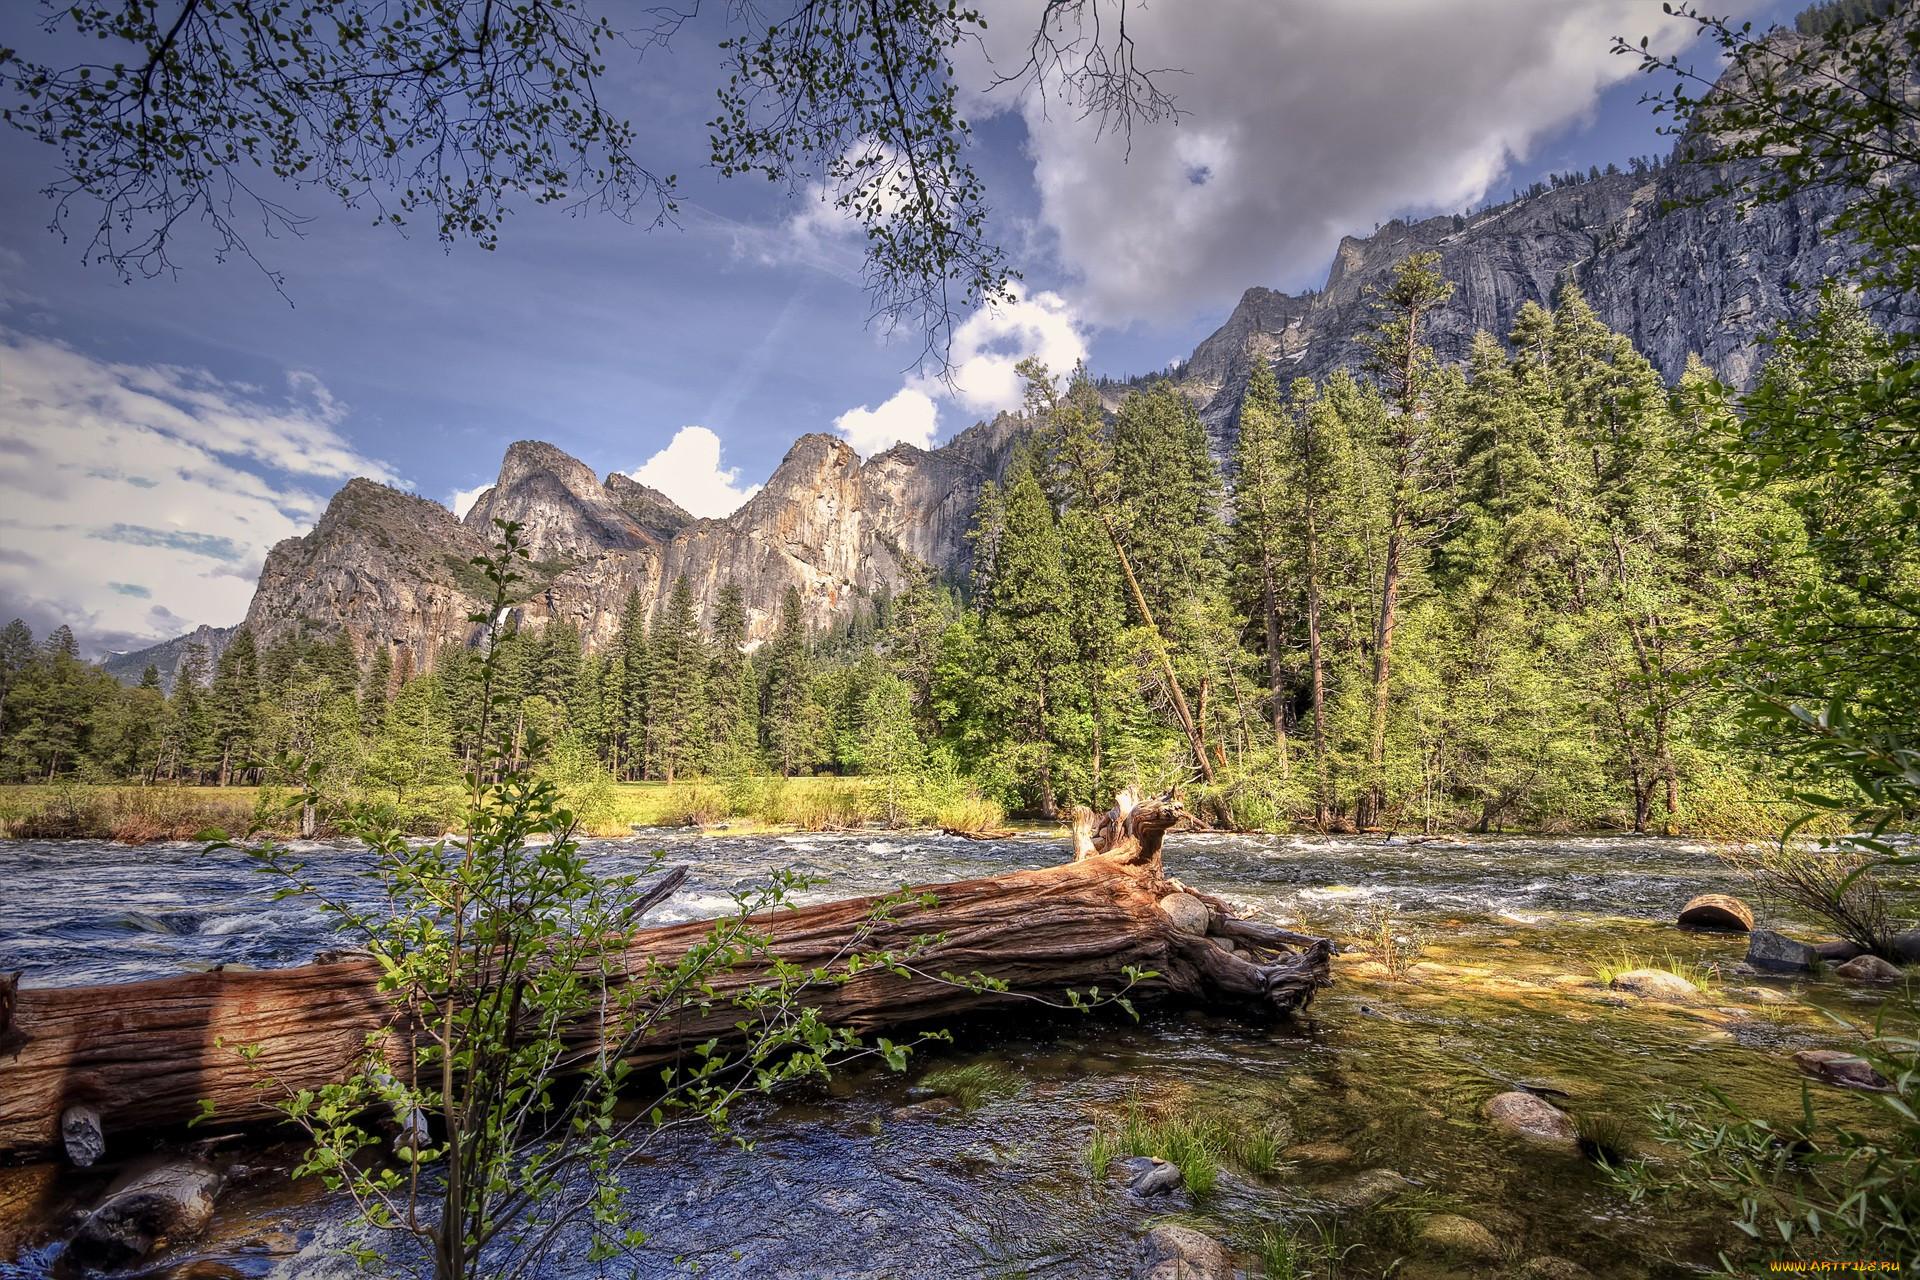 сути, дикая природа фото пейзаж абри сарнавишт